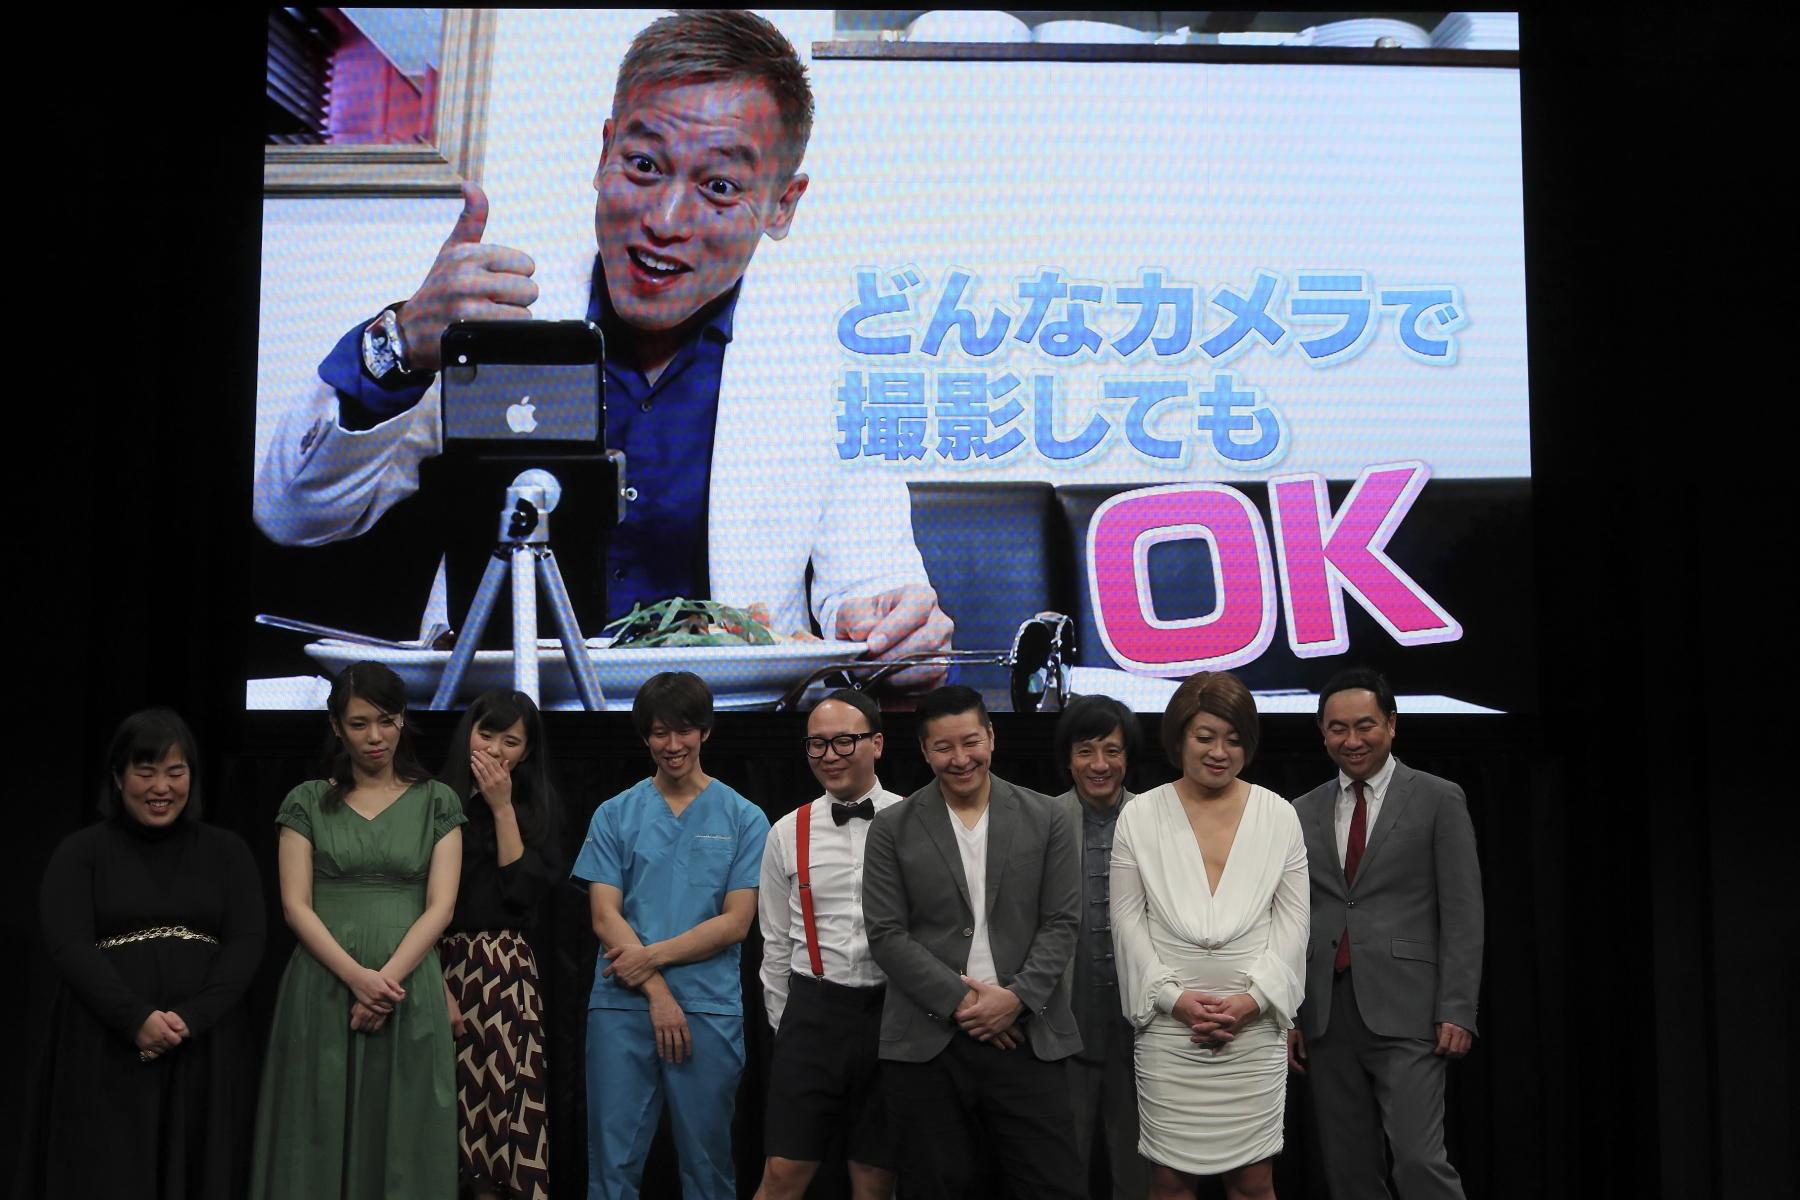 http://news.yoshimoto.co.jp/20181130143021-6466651e6c041c9d658770576f0e0c5ec0747a7d.jpg